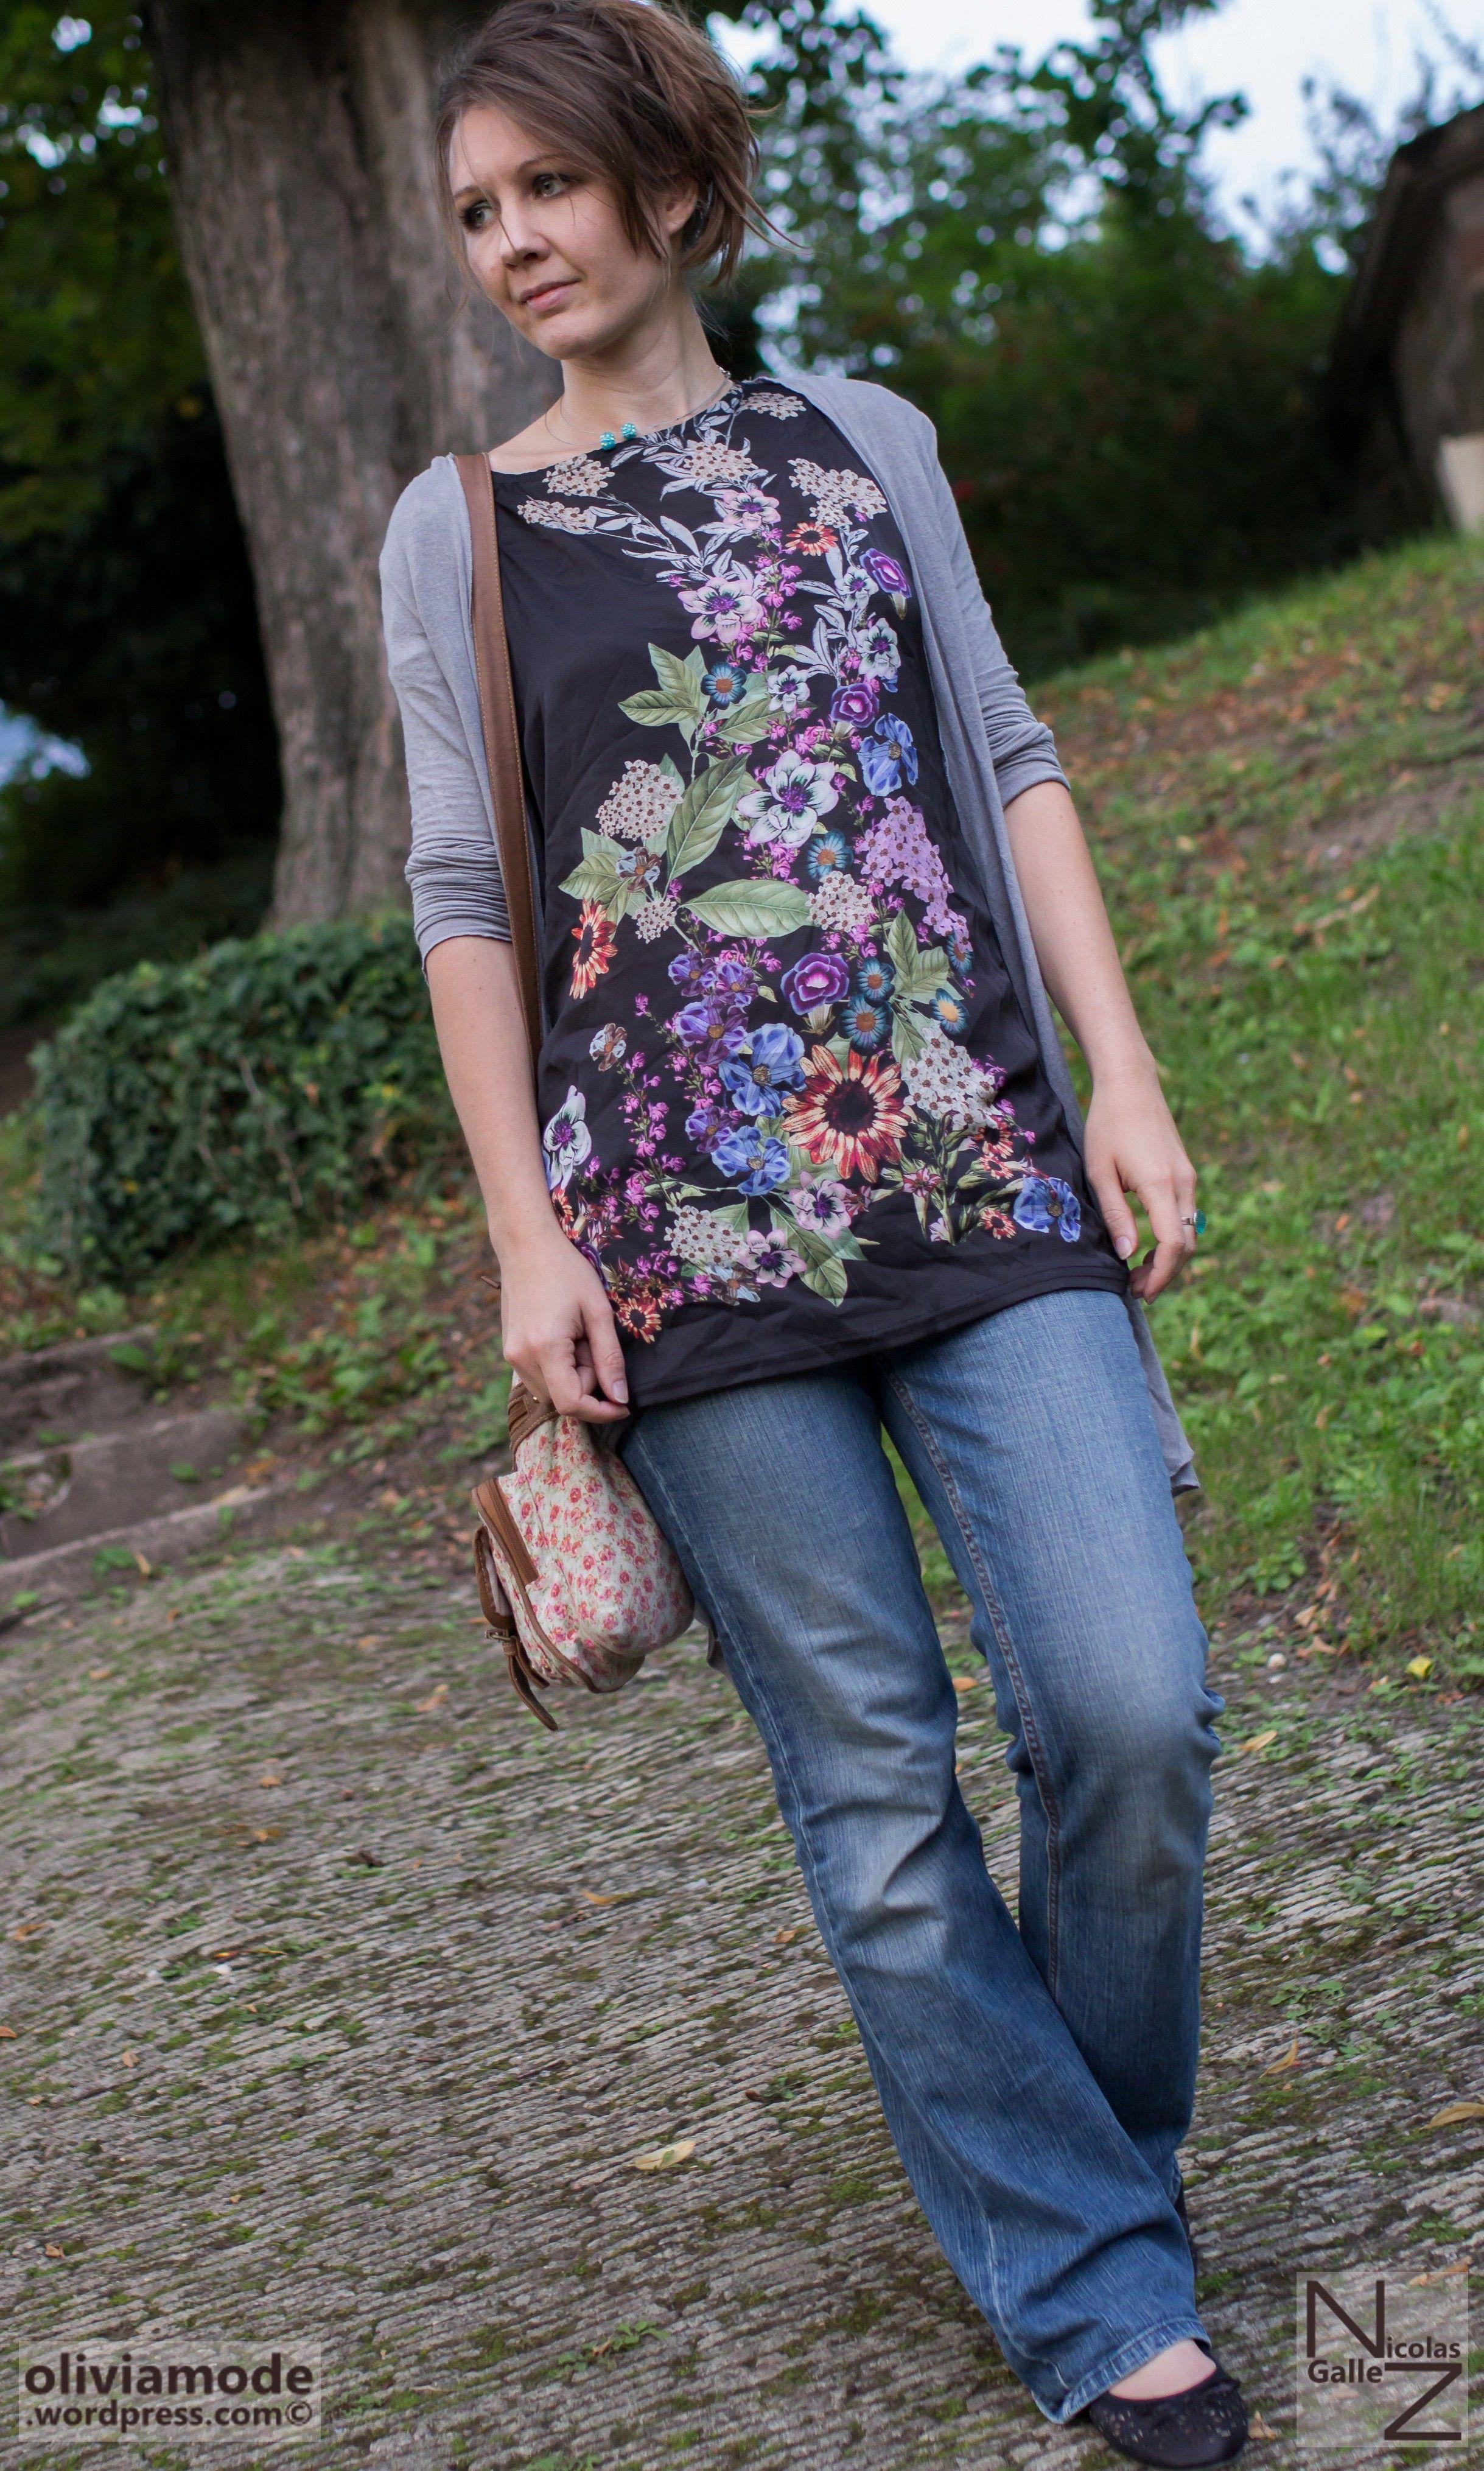 olivia-schneider-oliviaode-tunique-imprimee-photo-fleurs-jean-gilet-gris-ballerines-ajourees3.jpg (Image JPEG, 2438×4059 pixels) - Redimensionnée (23%)